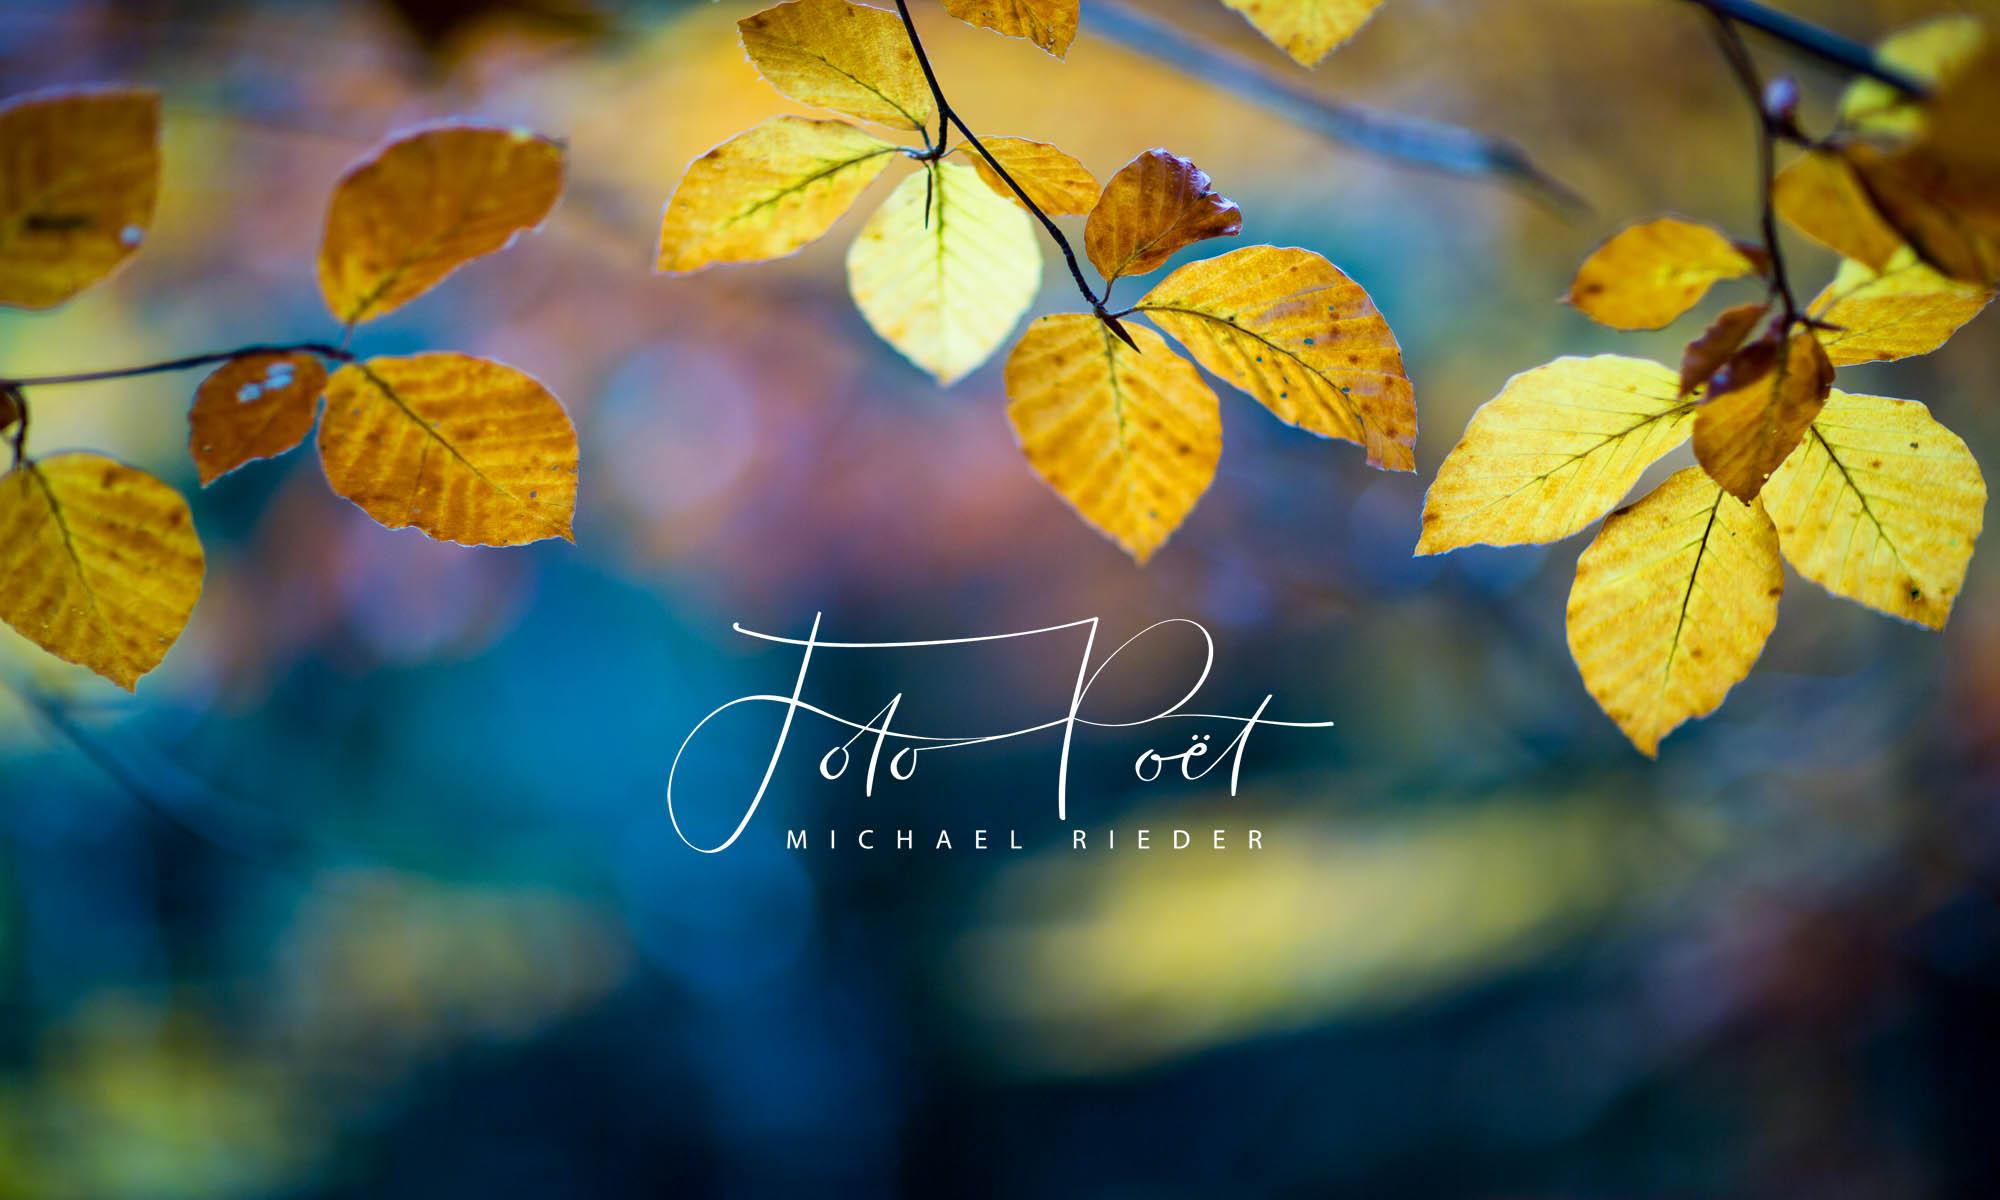 Foto-Poet